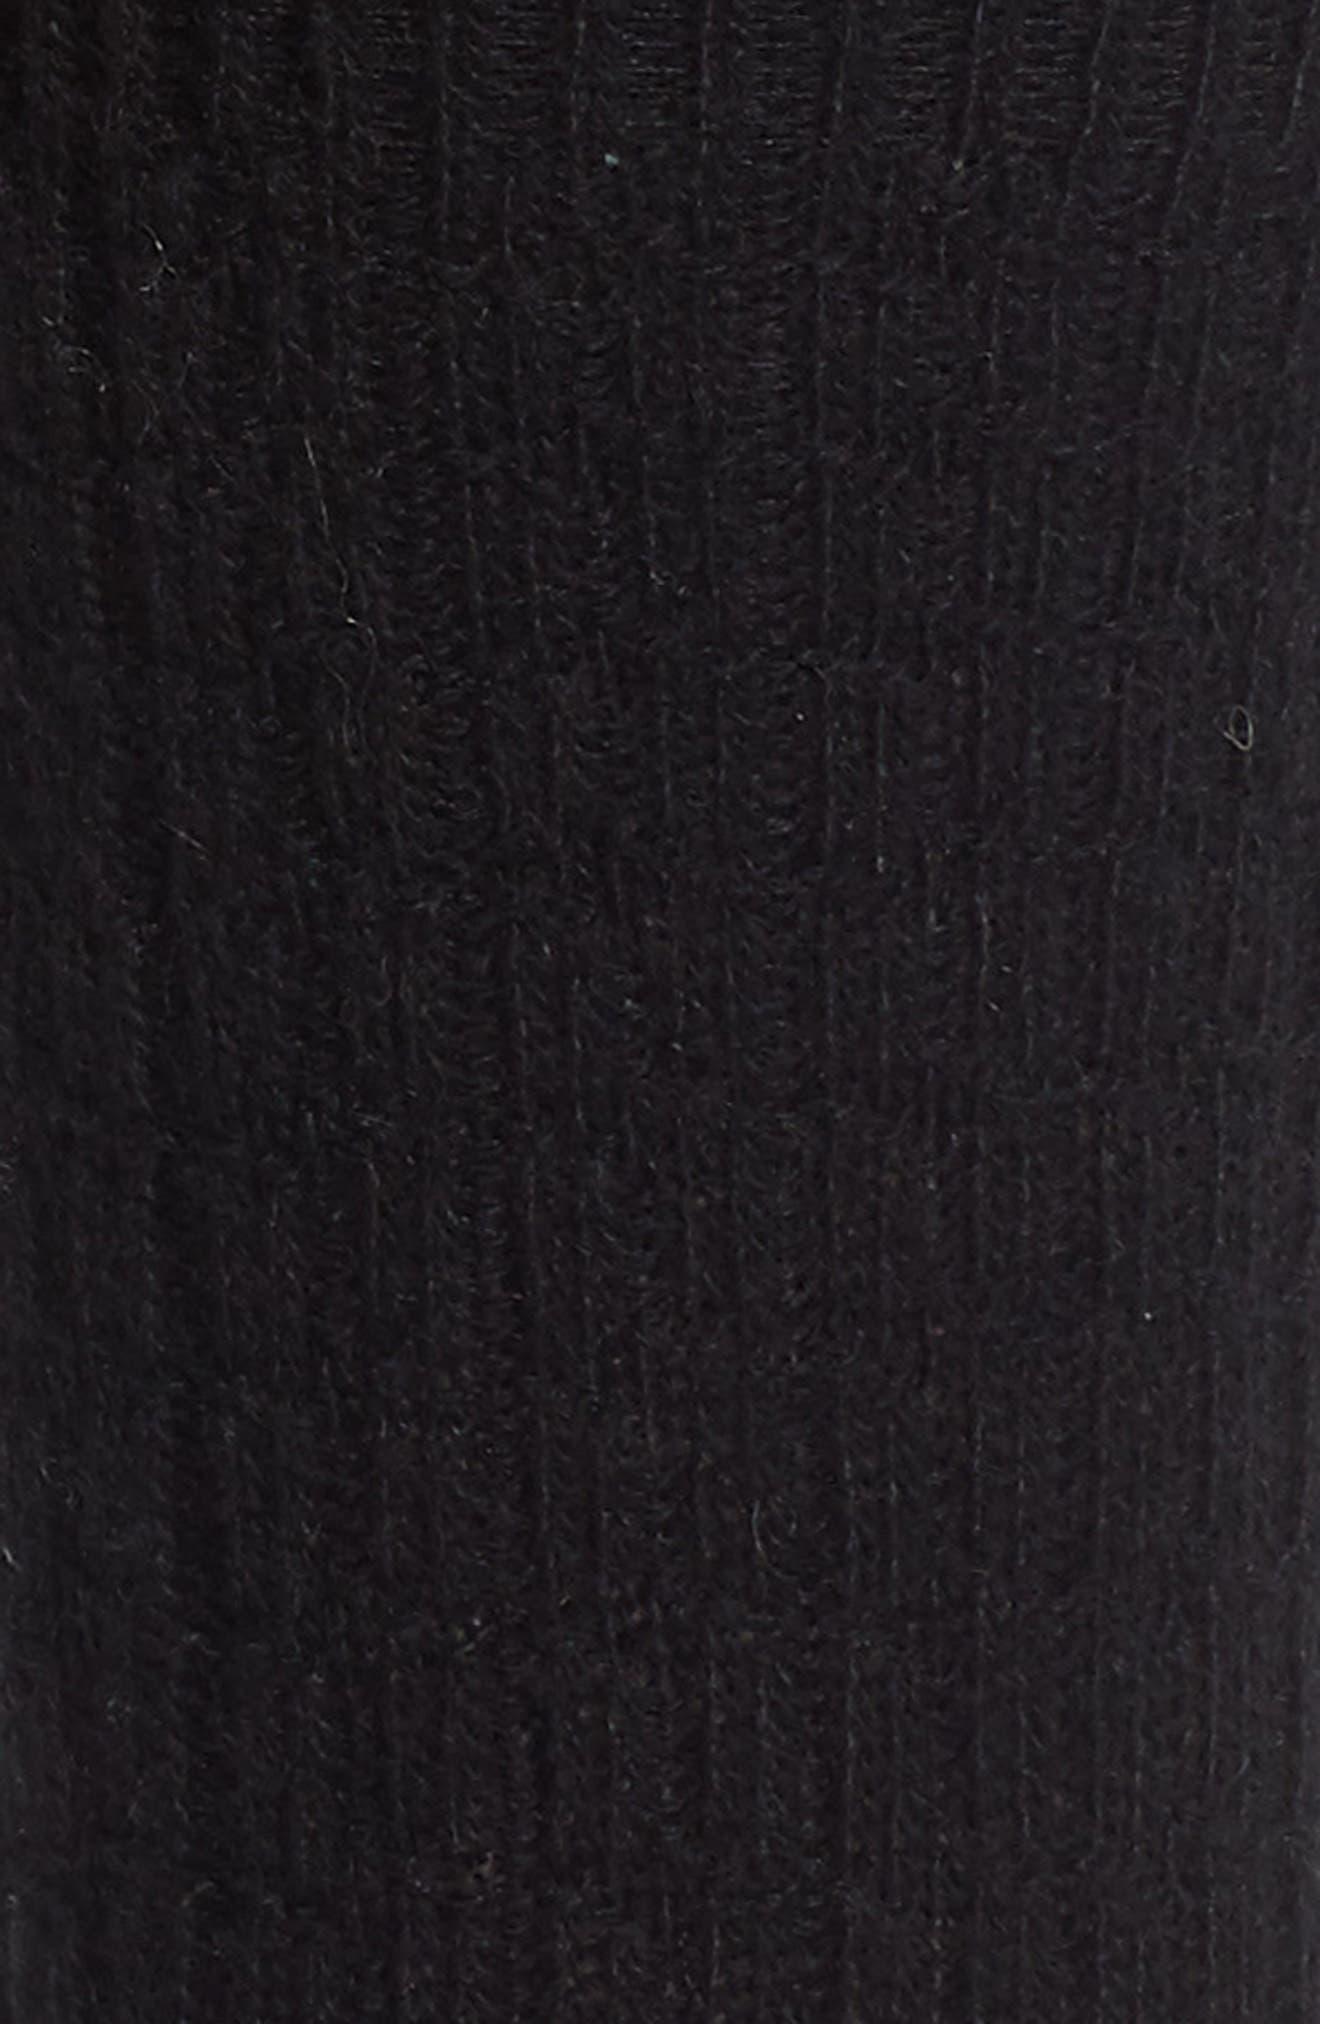 Cable Knit Cashmere Blend Crew Socks,                             Alternate thumbnail 2, color,                             BLACK